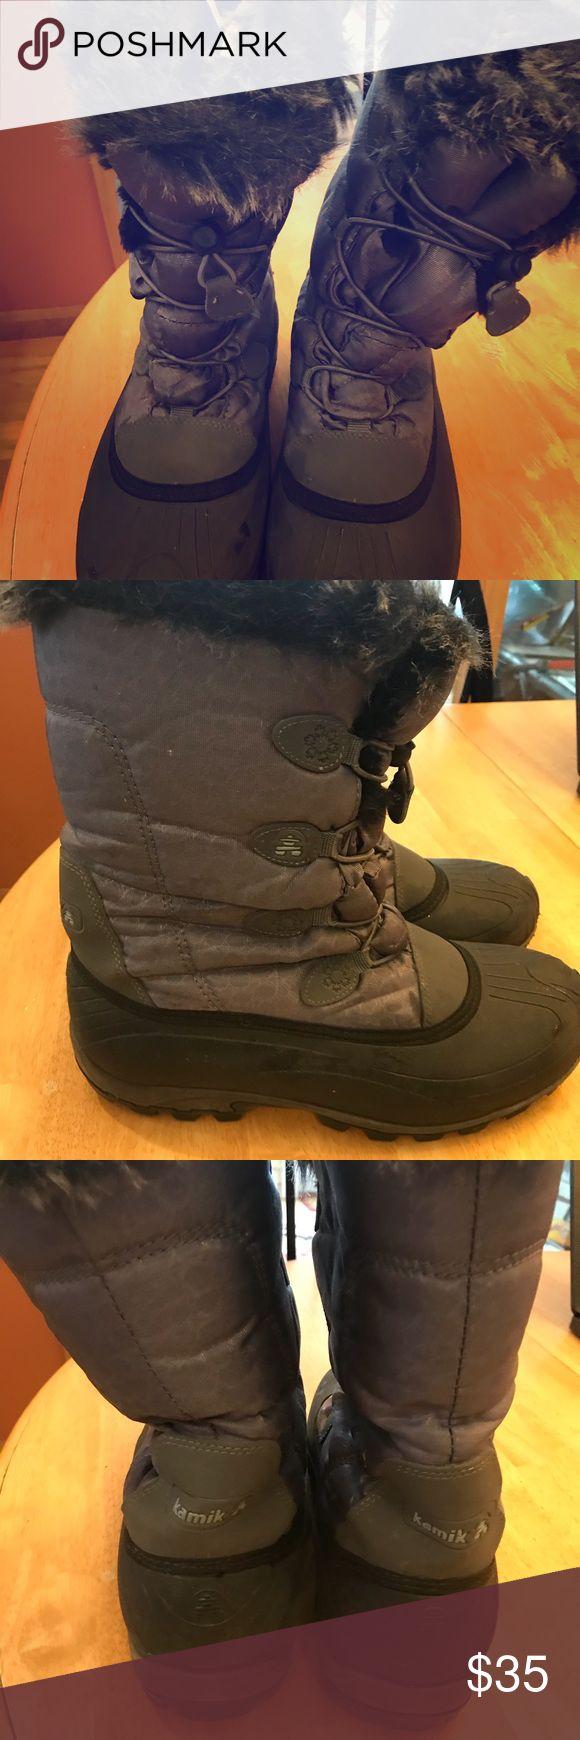 Jamie women's winter boots Great condition Kamik women's winter boots. Kamik Shoes Winter & Rain Boots